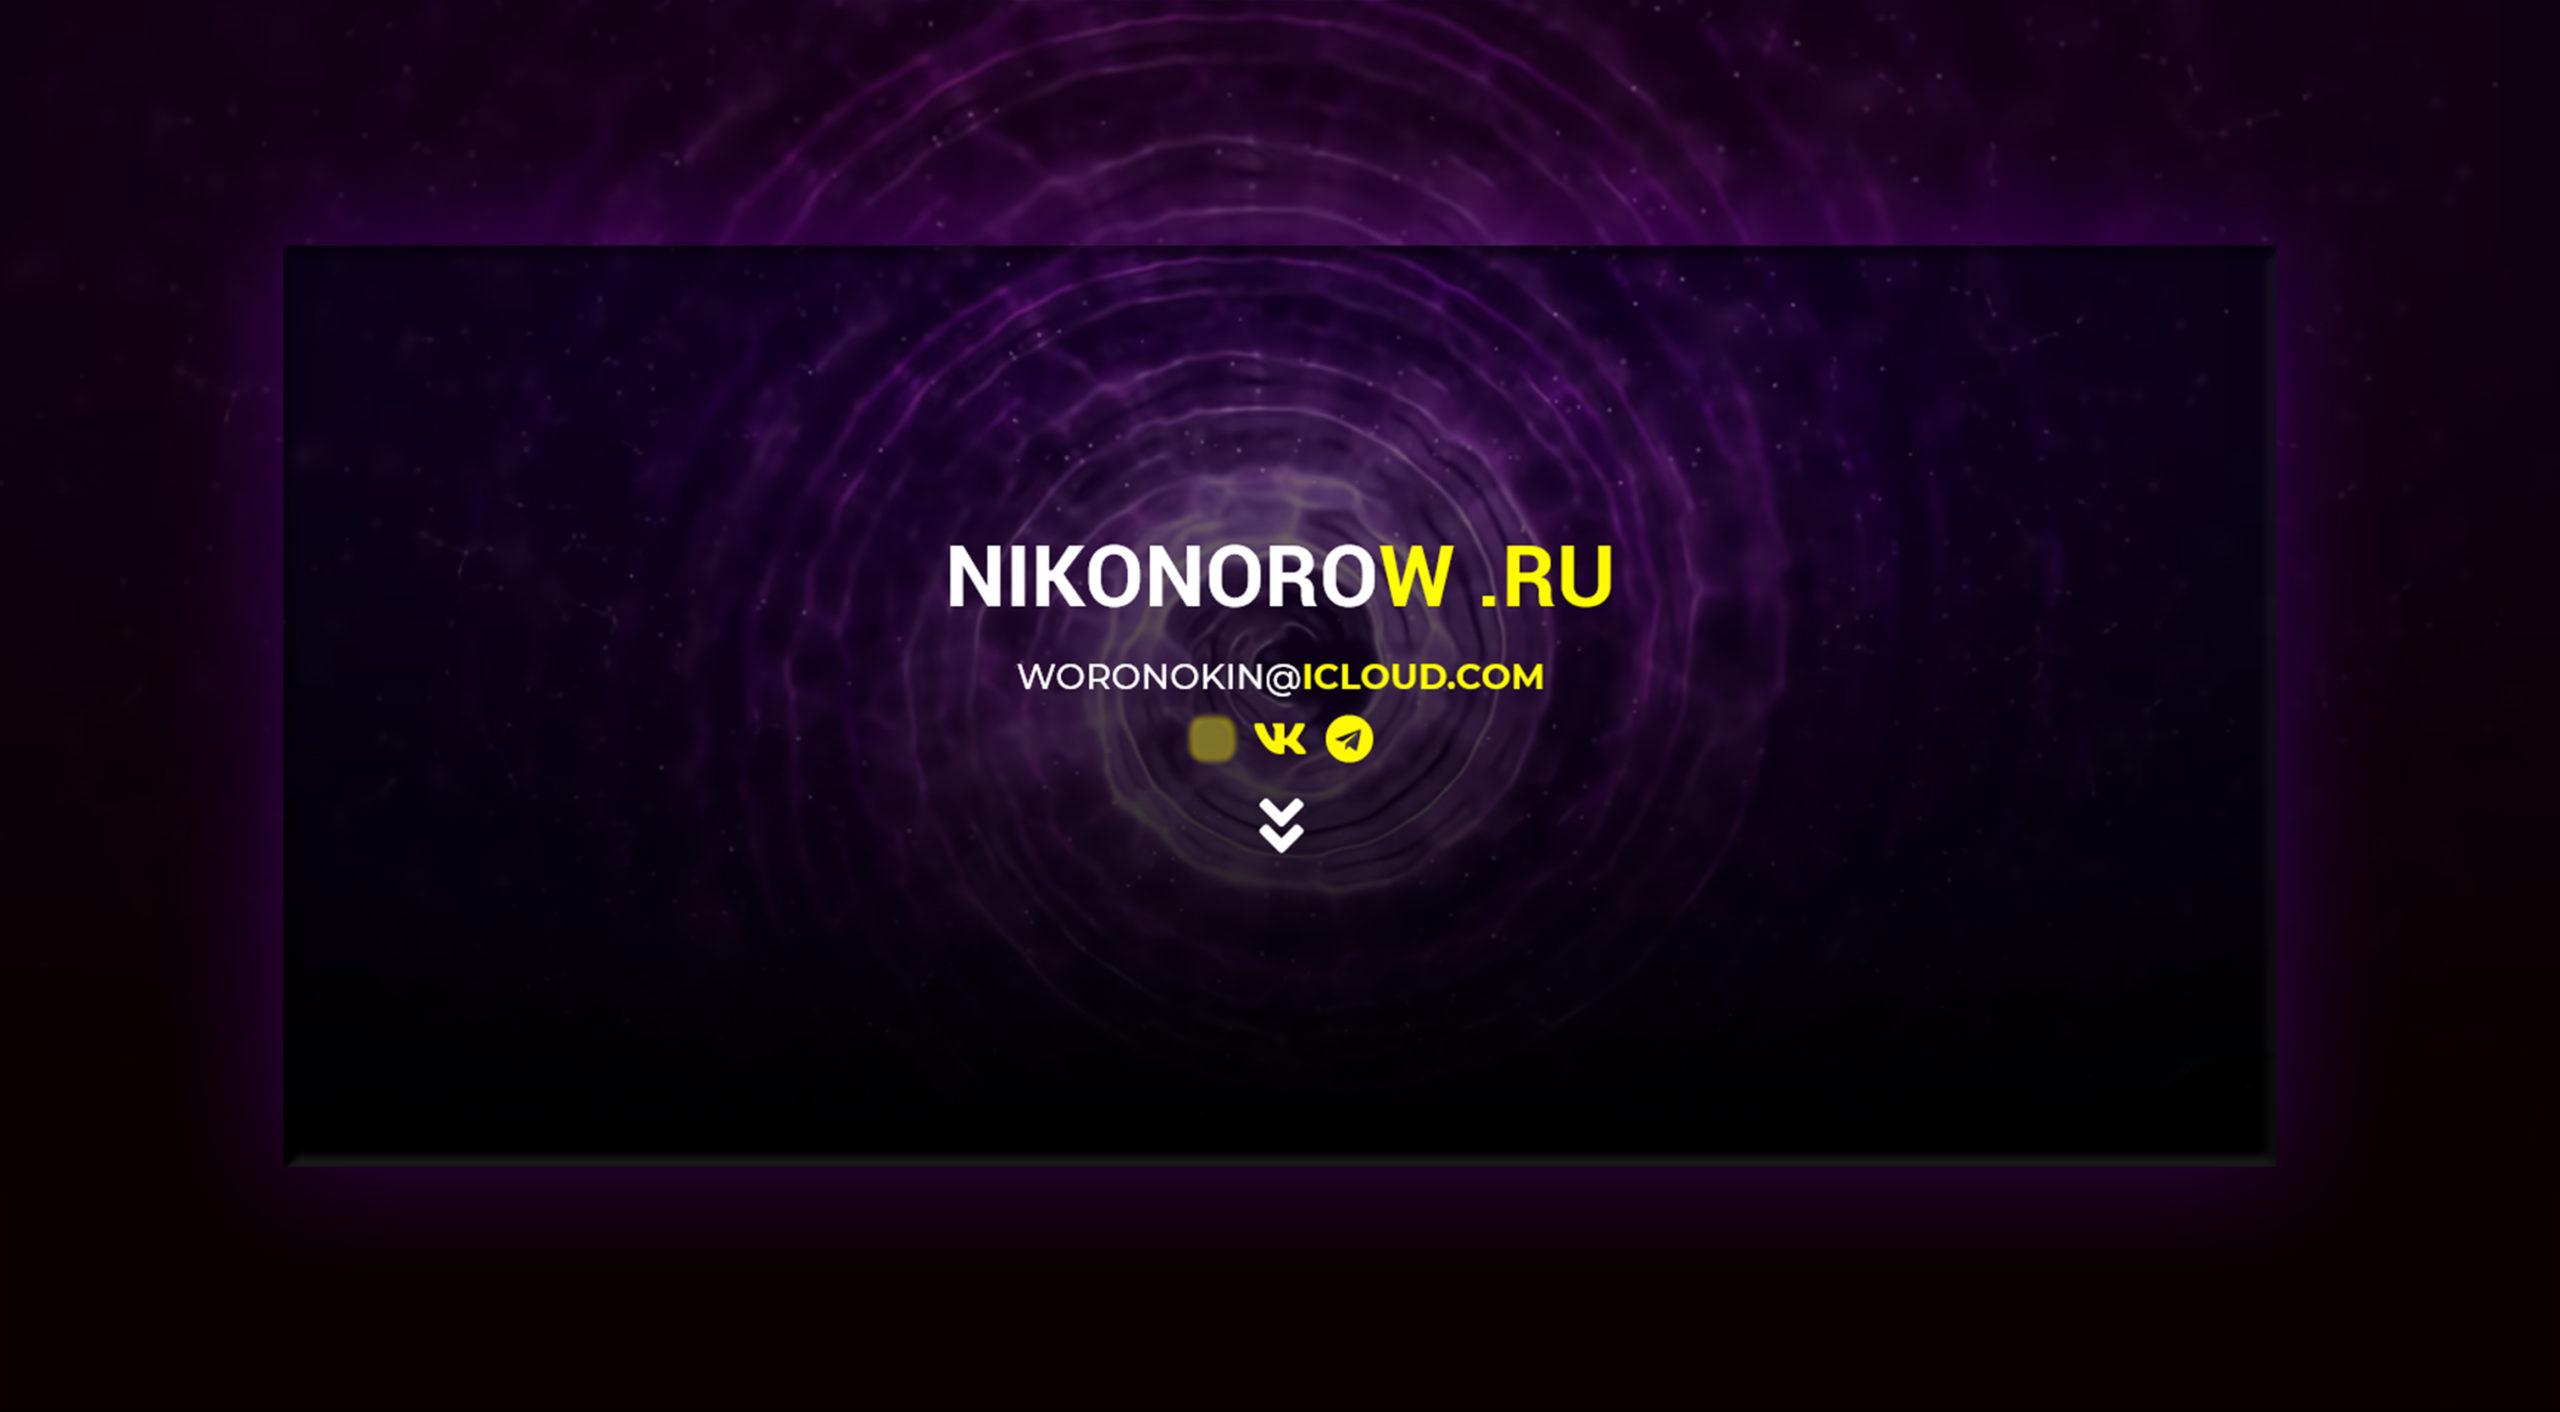 Nikonorow.ru - сайт-портфолио